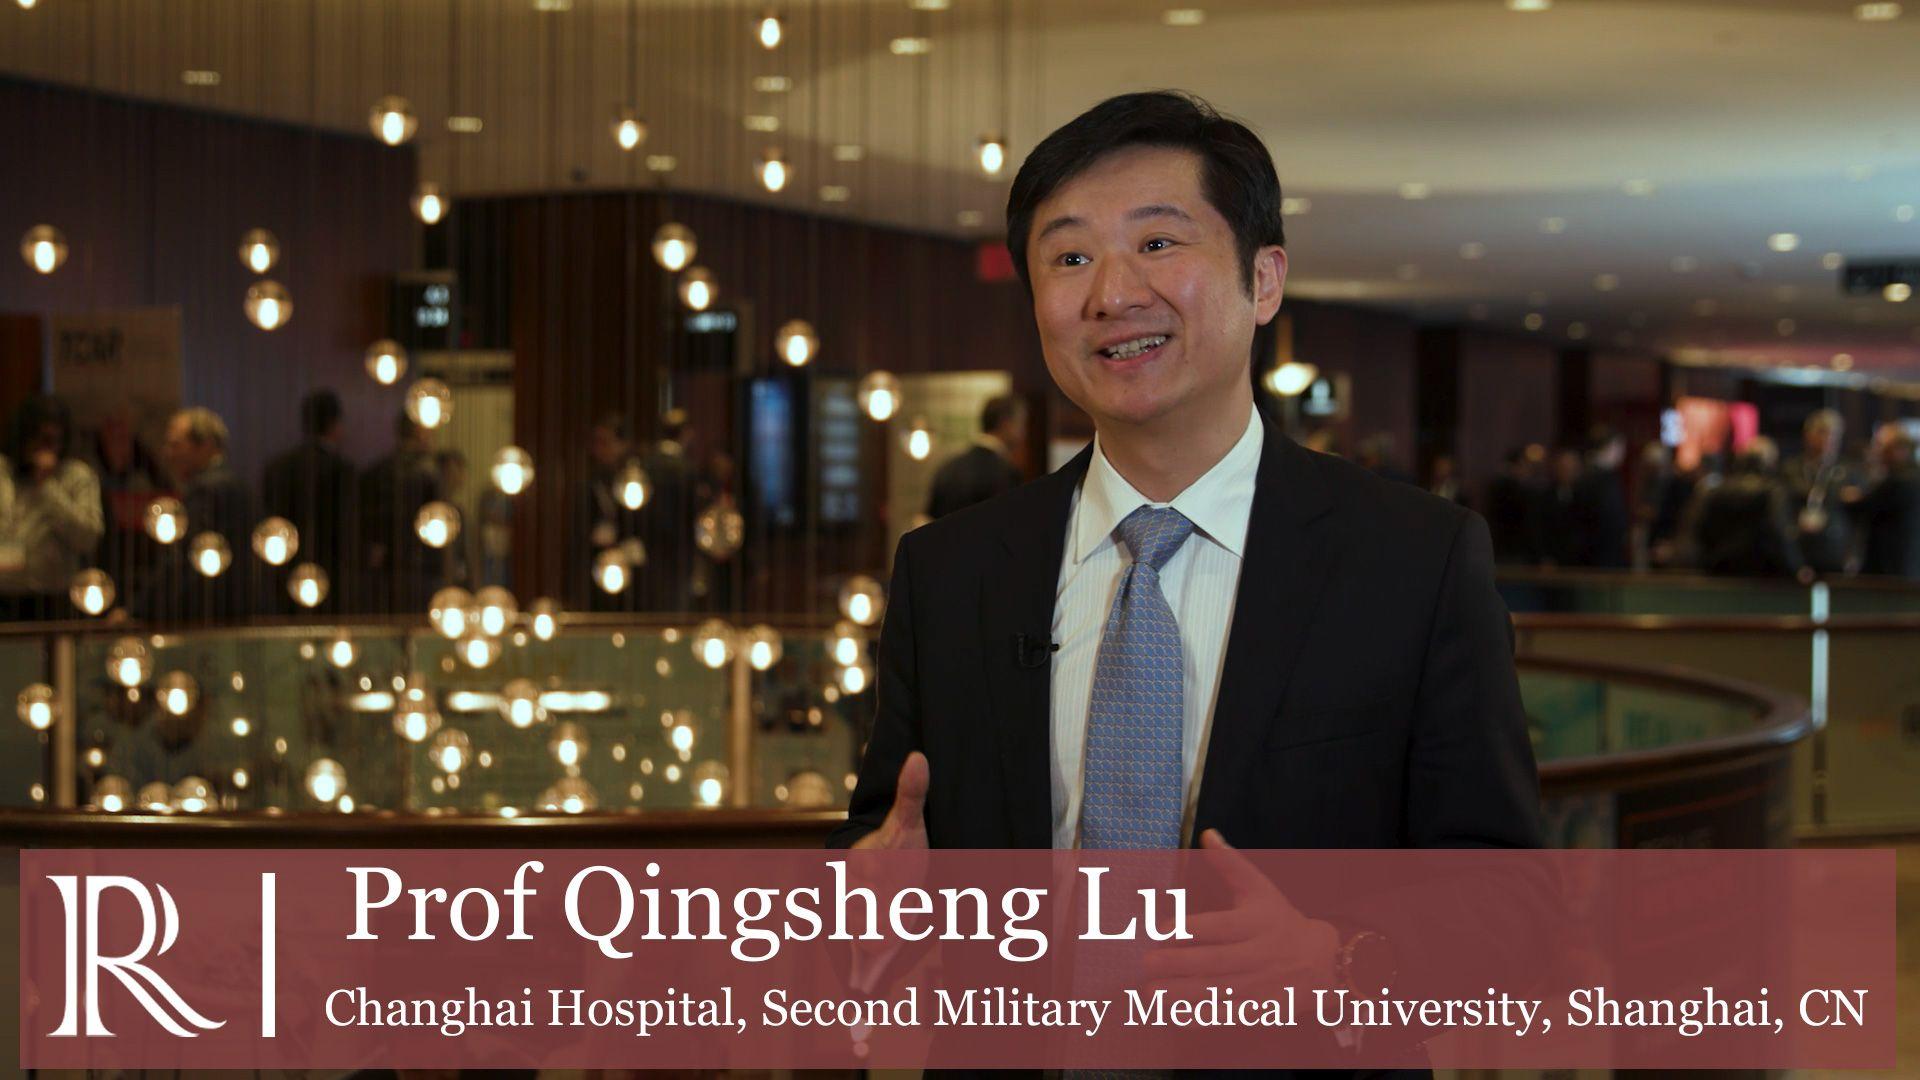 VEITHsymposium™ 2019: Vascular Robotics — Prof Qingsheng Lu